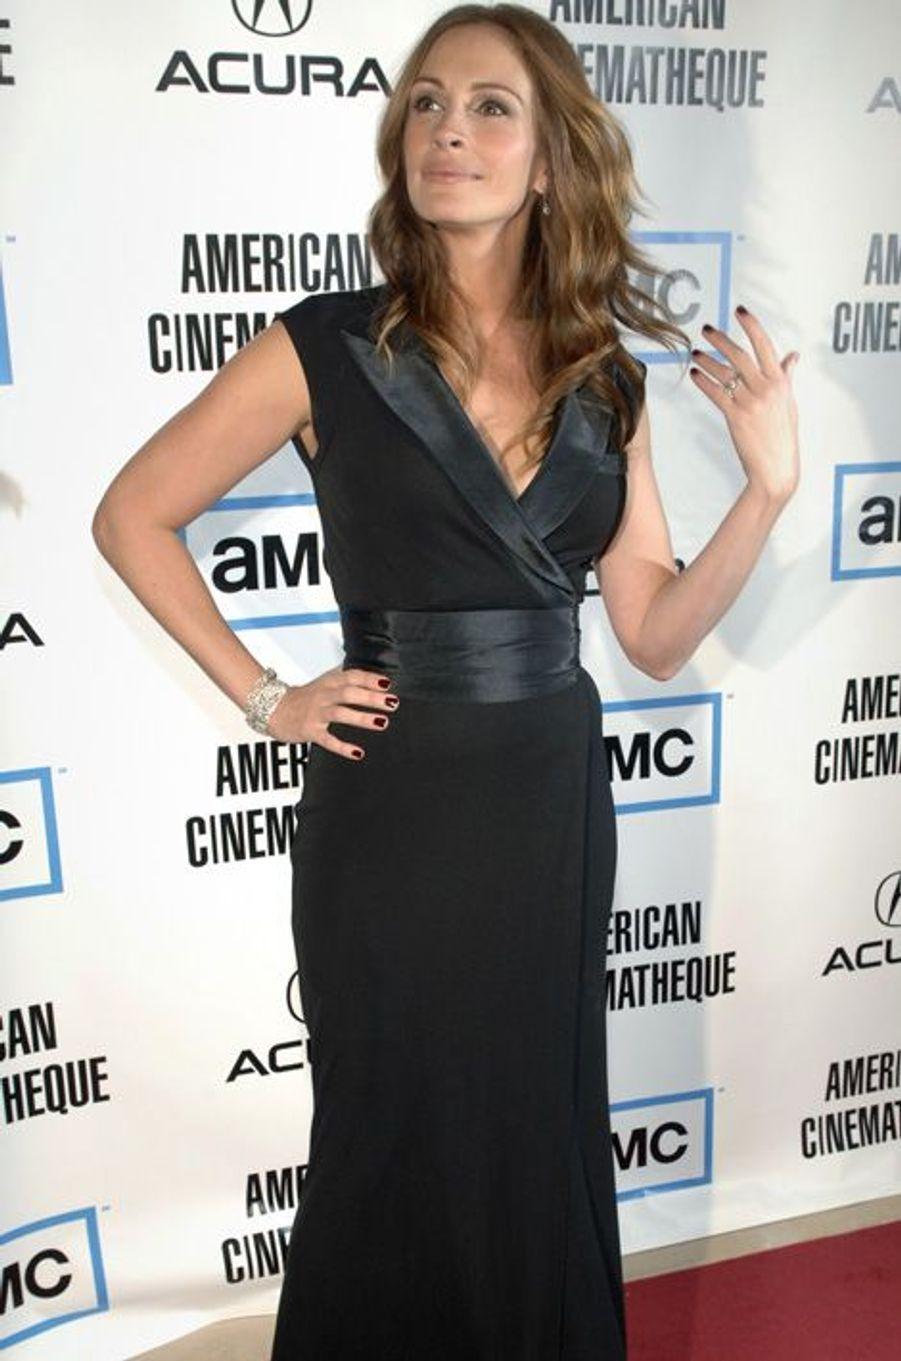 Aux American Cinematheque Awards en 2007, juste avant de recevoir son prix